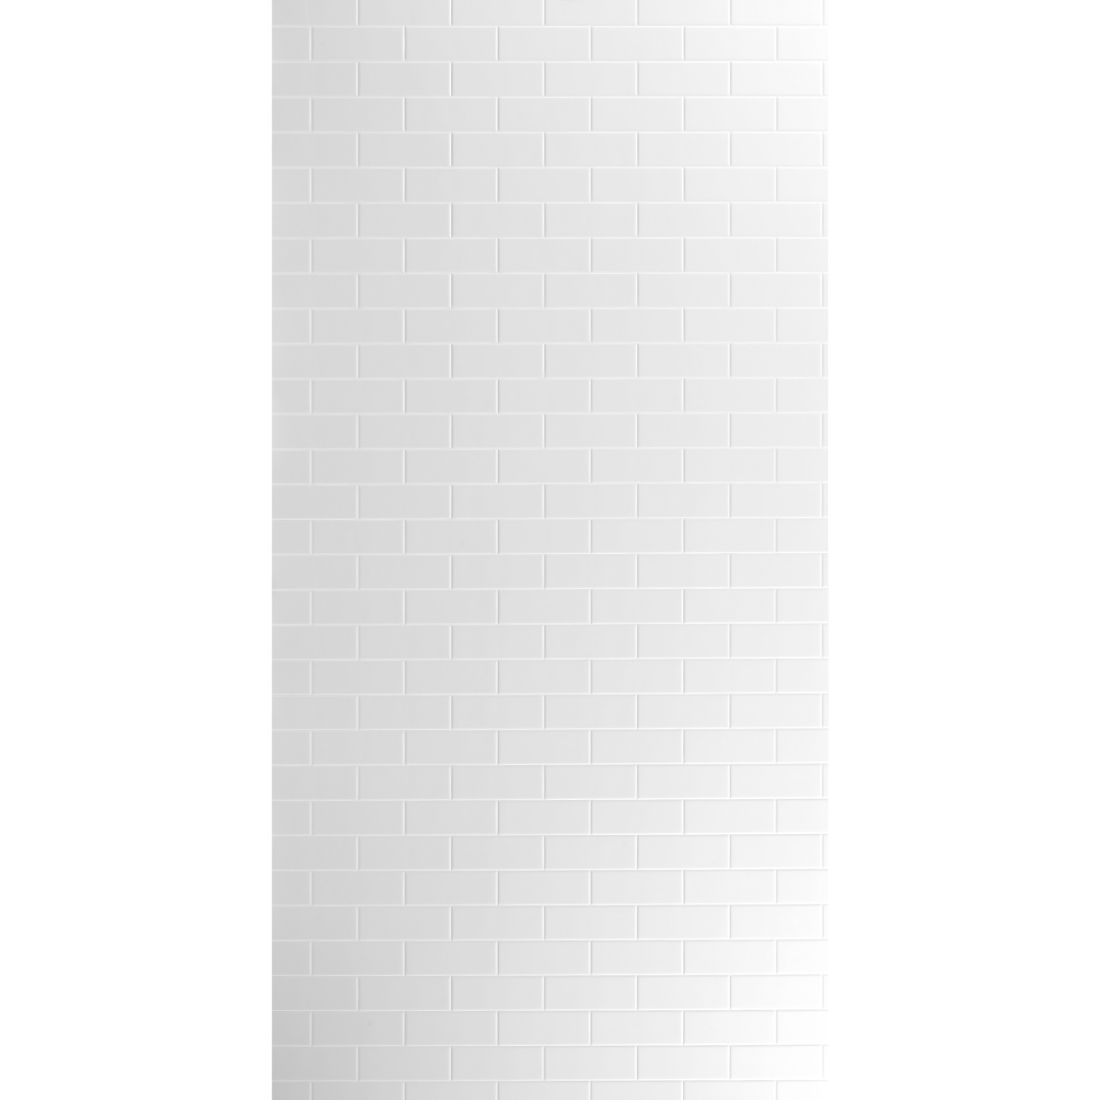 Aqua Wall Lining Panel Polar White Subway Tile 2400 x 1200 x 4.5mm